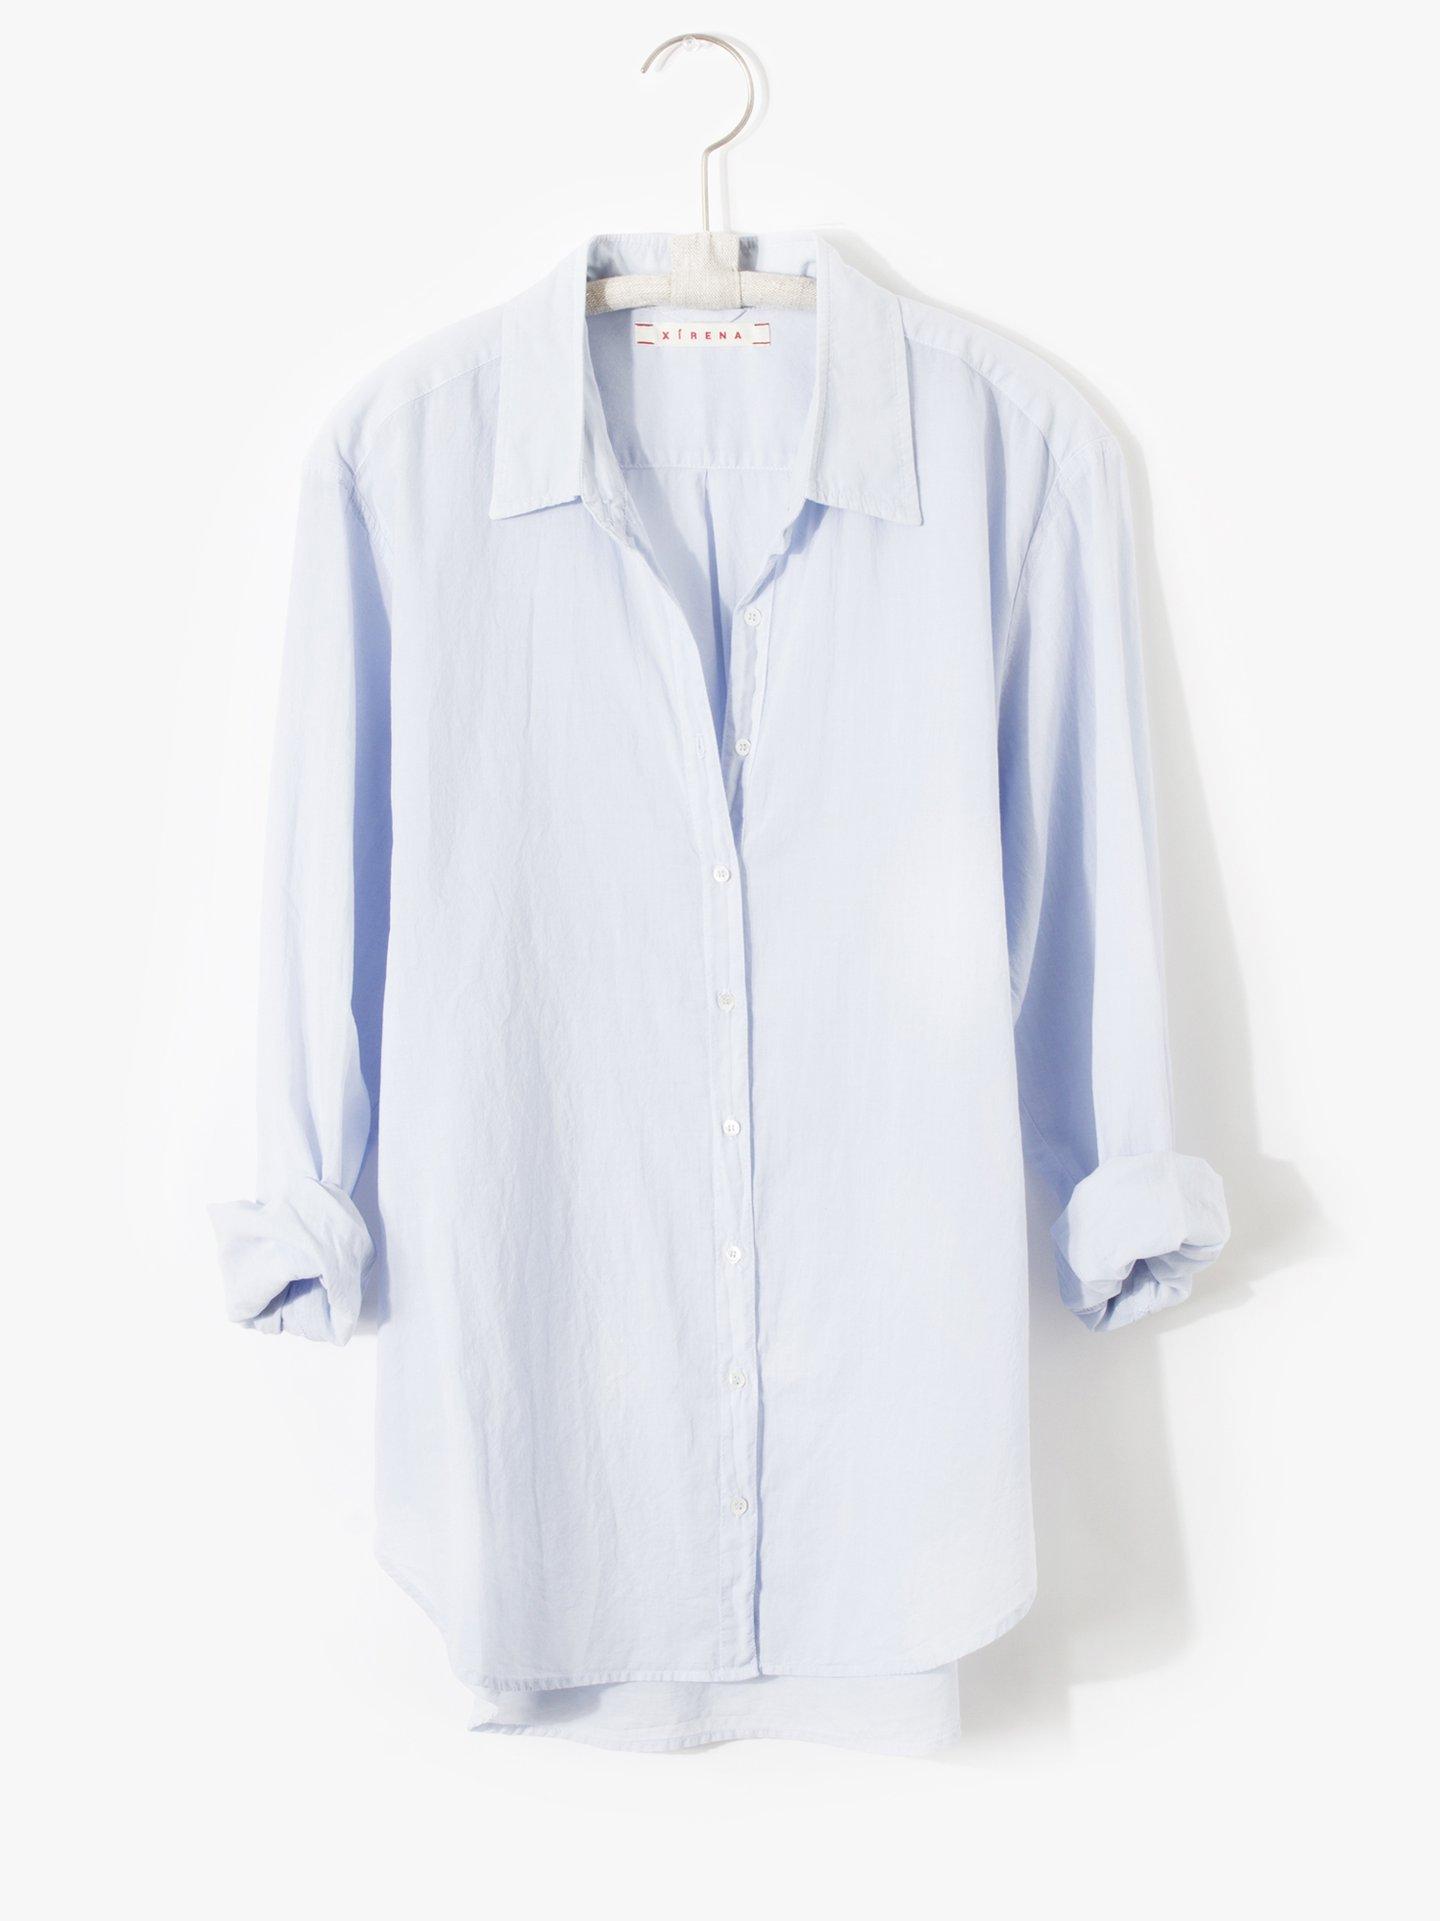 Xirena, Beau Shirt, Boyfriendshirt, Bluse